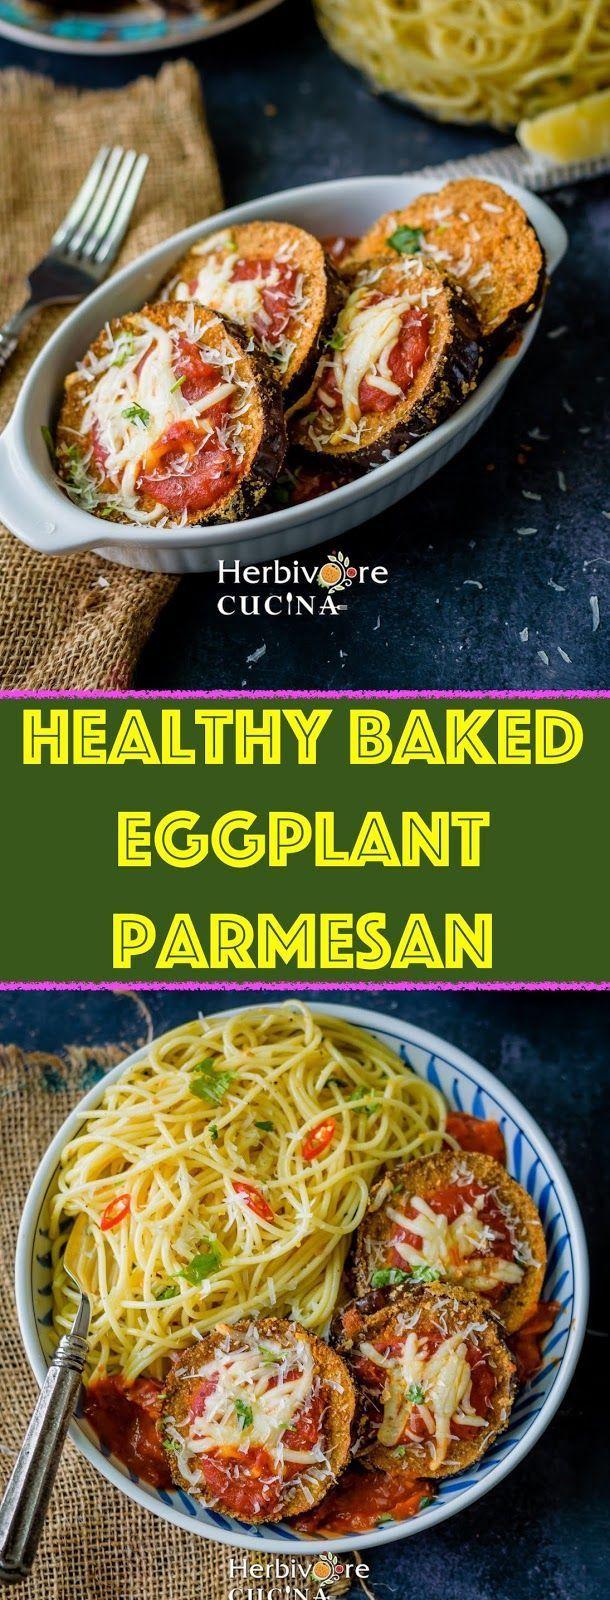 Healthy BAKED Eggplant Parmesan images